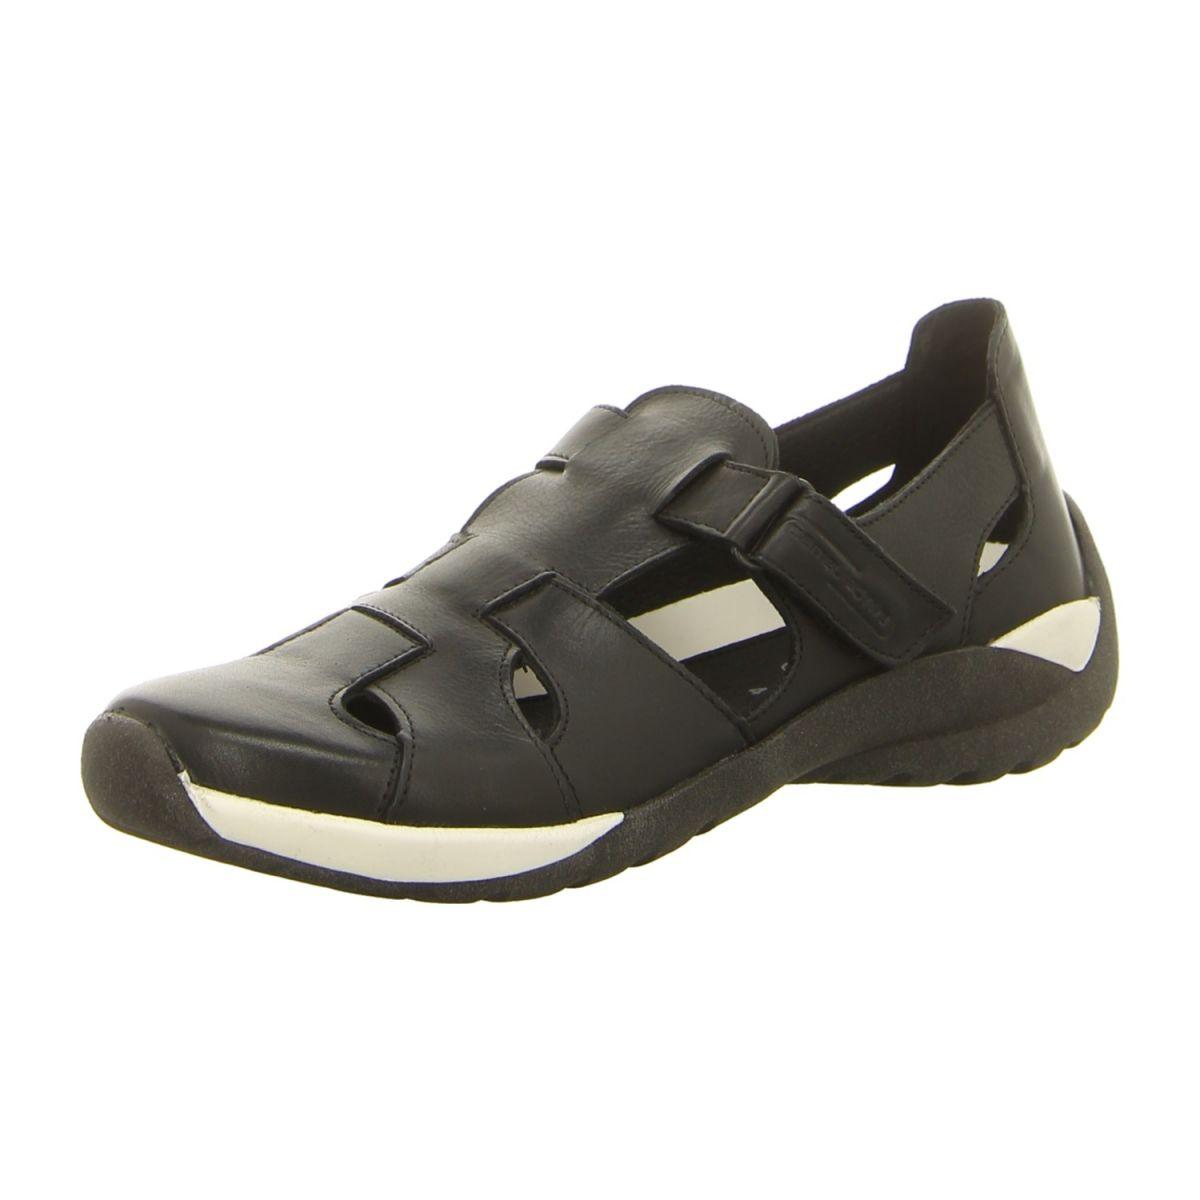 Moonlight 75 | Schuhe & Accessoires | Schwarzer slipper